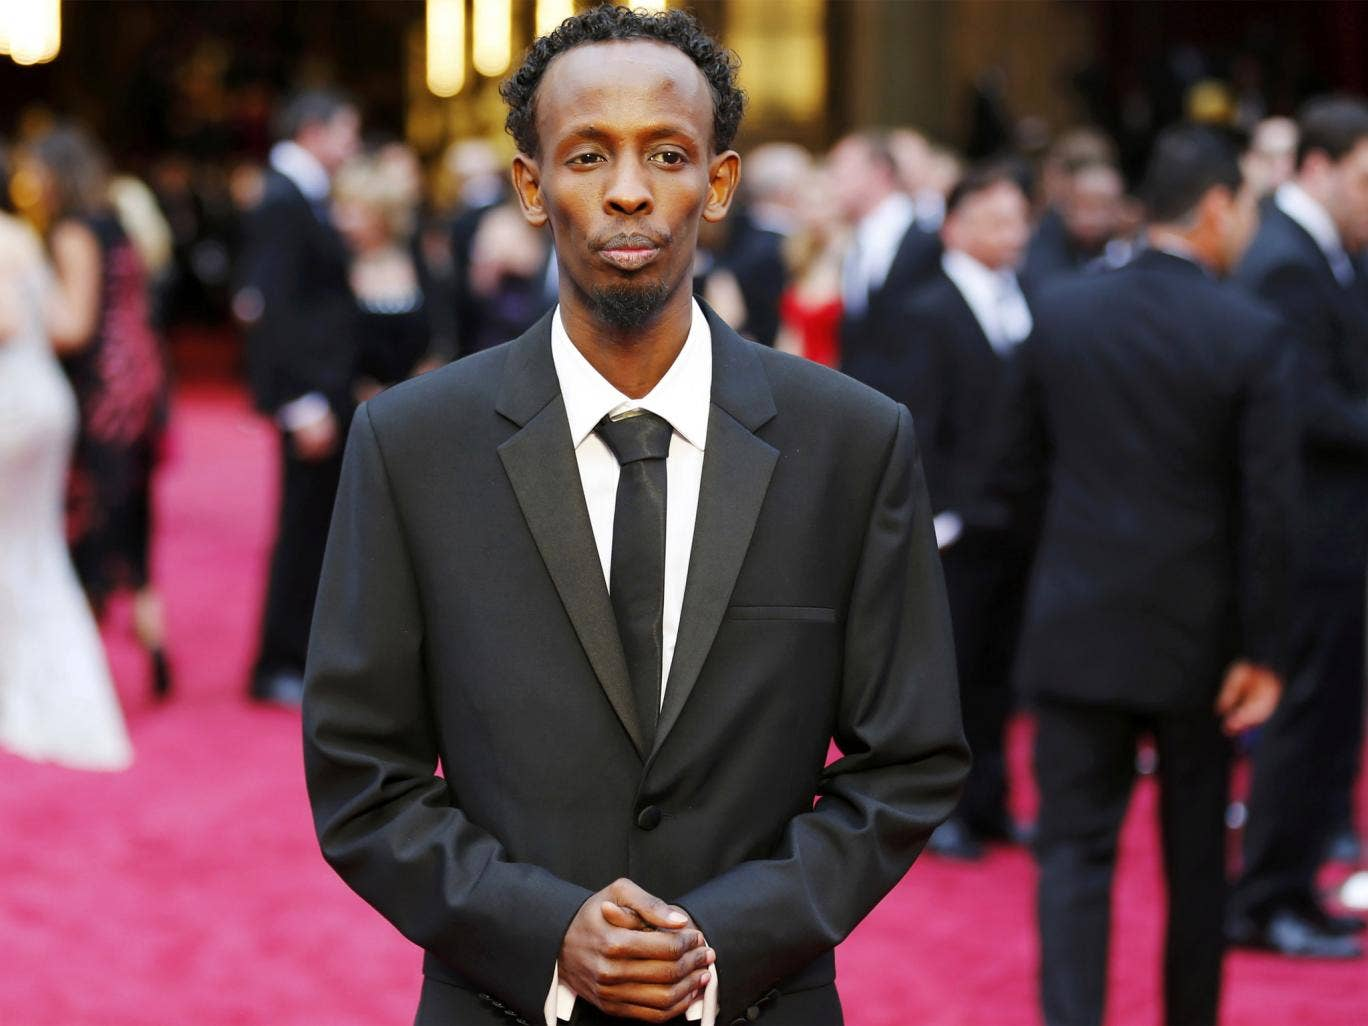 Barkhad Abdi arriving at Sunday's Oscars ceremony